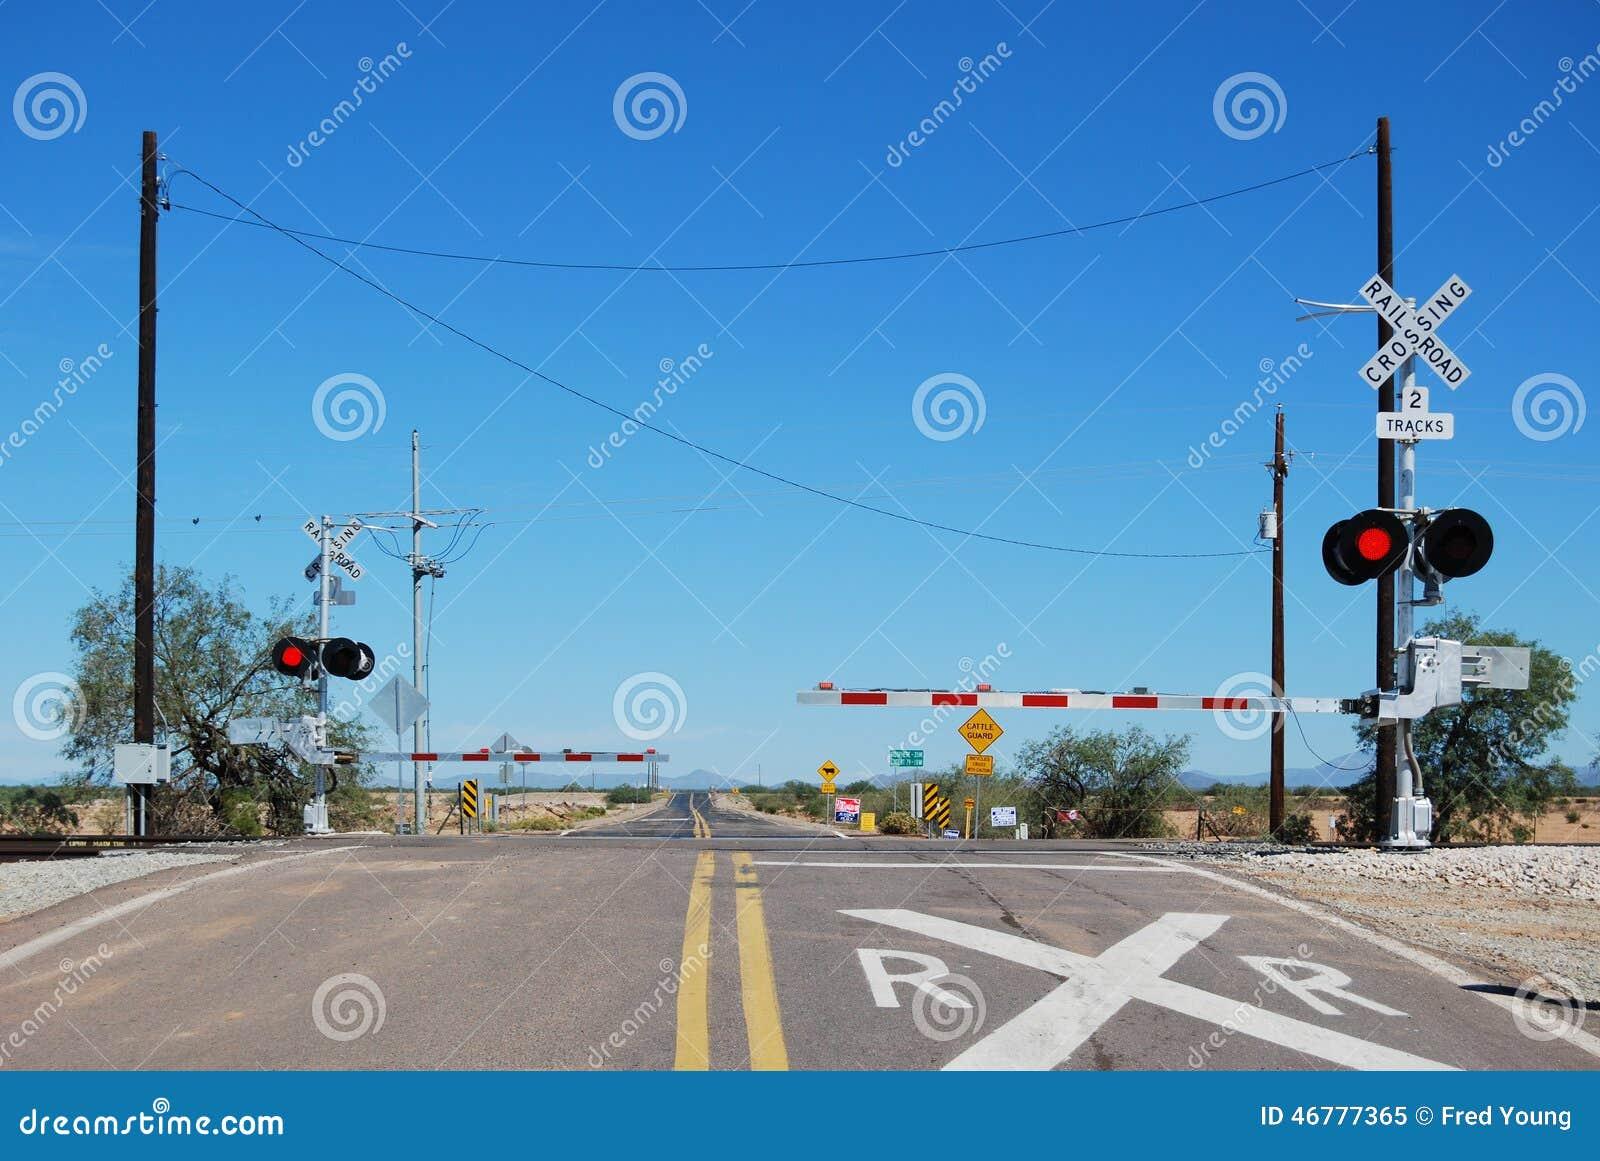 Railroad crossing stock image of train